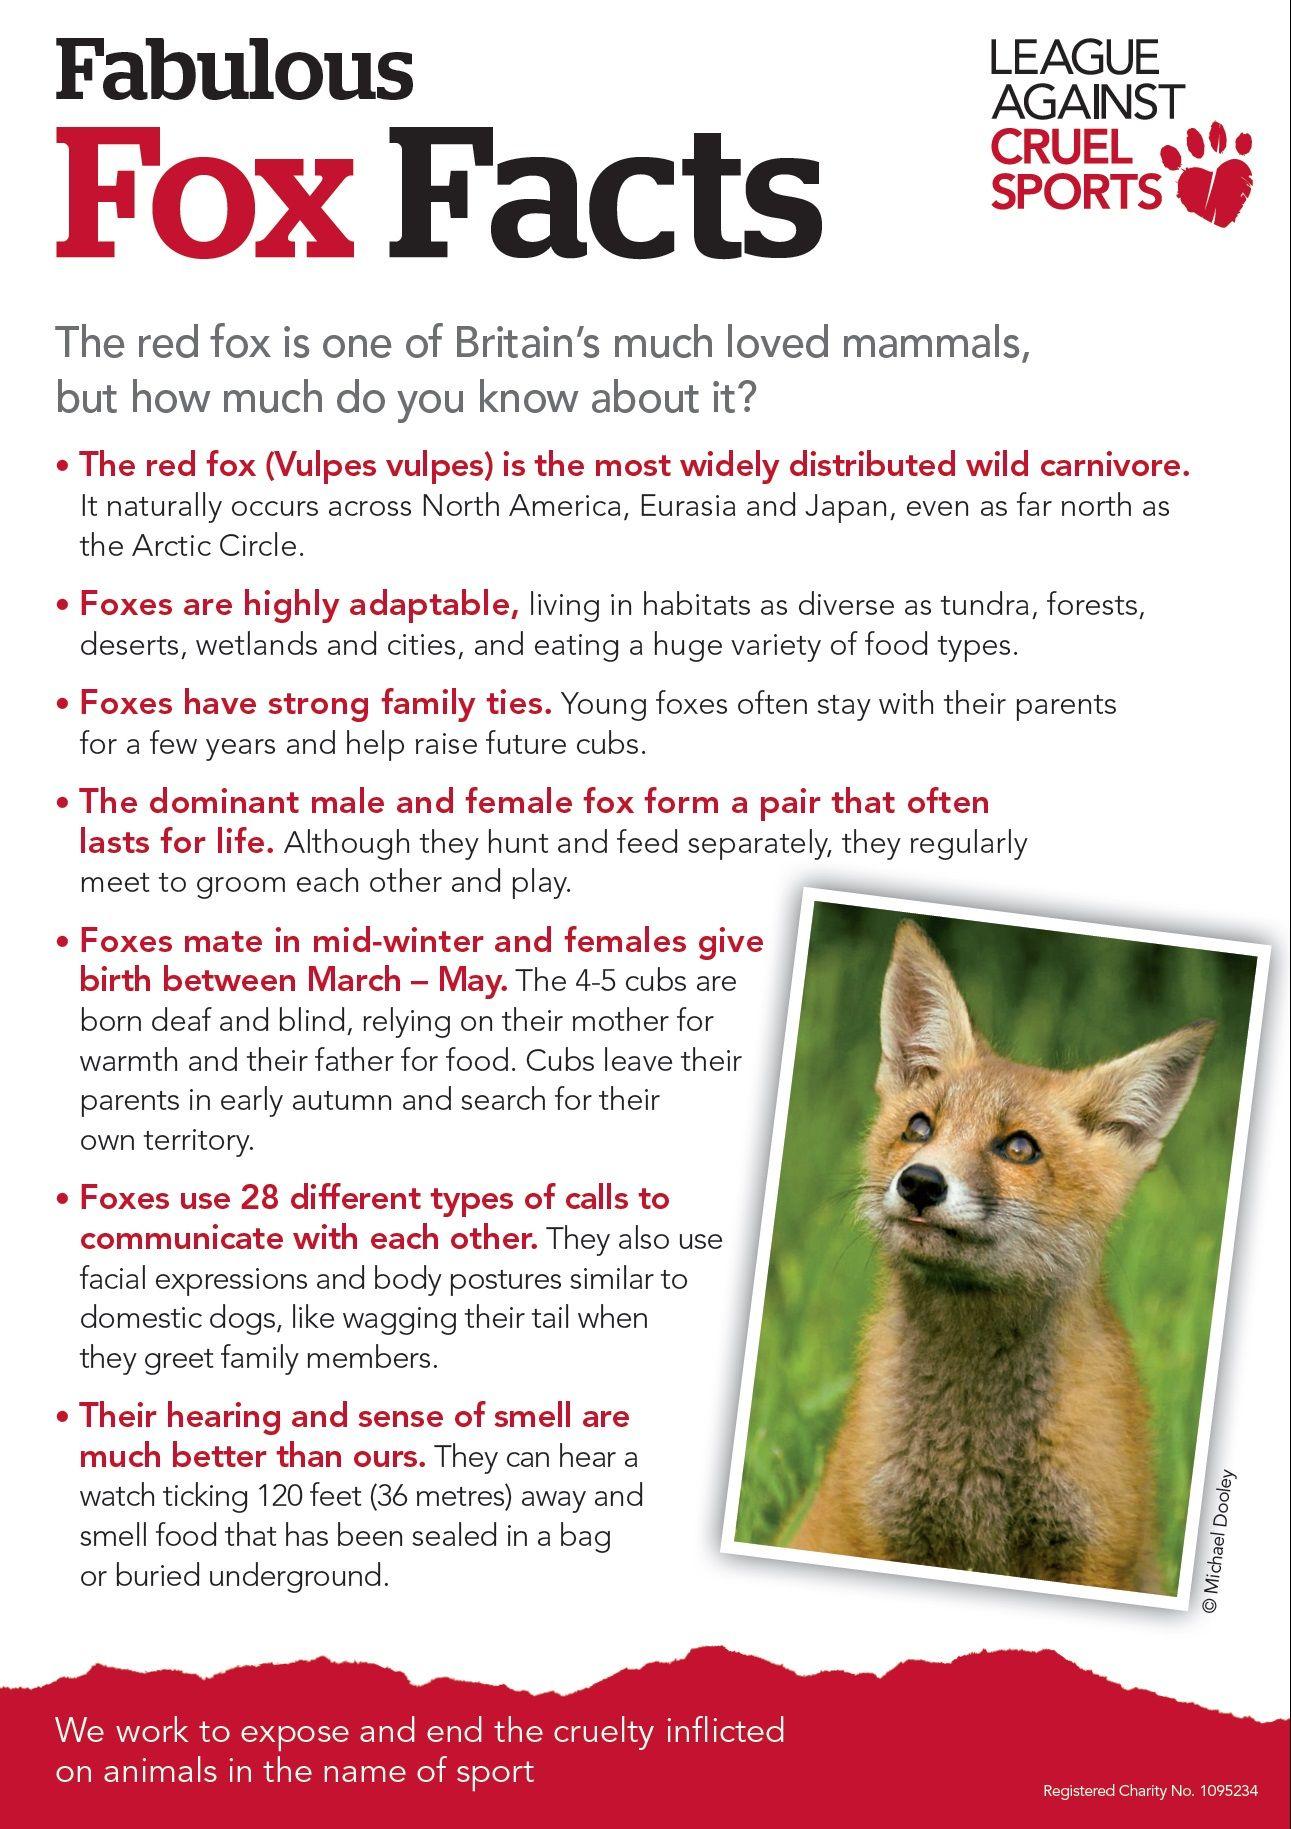 Some Fabulous Fox Facts For Foxy Feb League